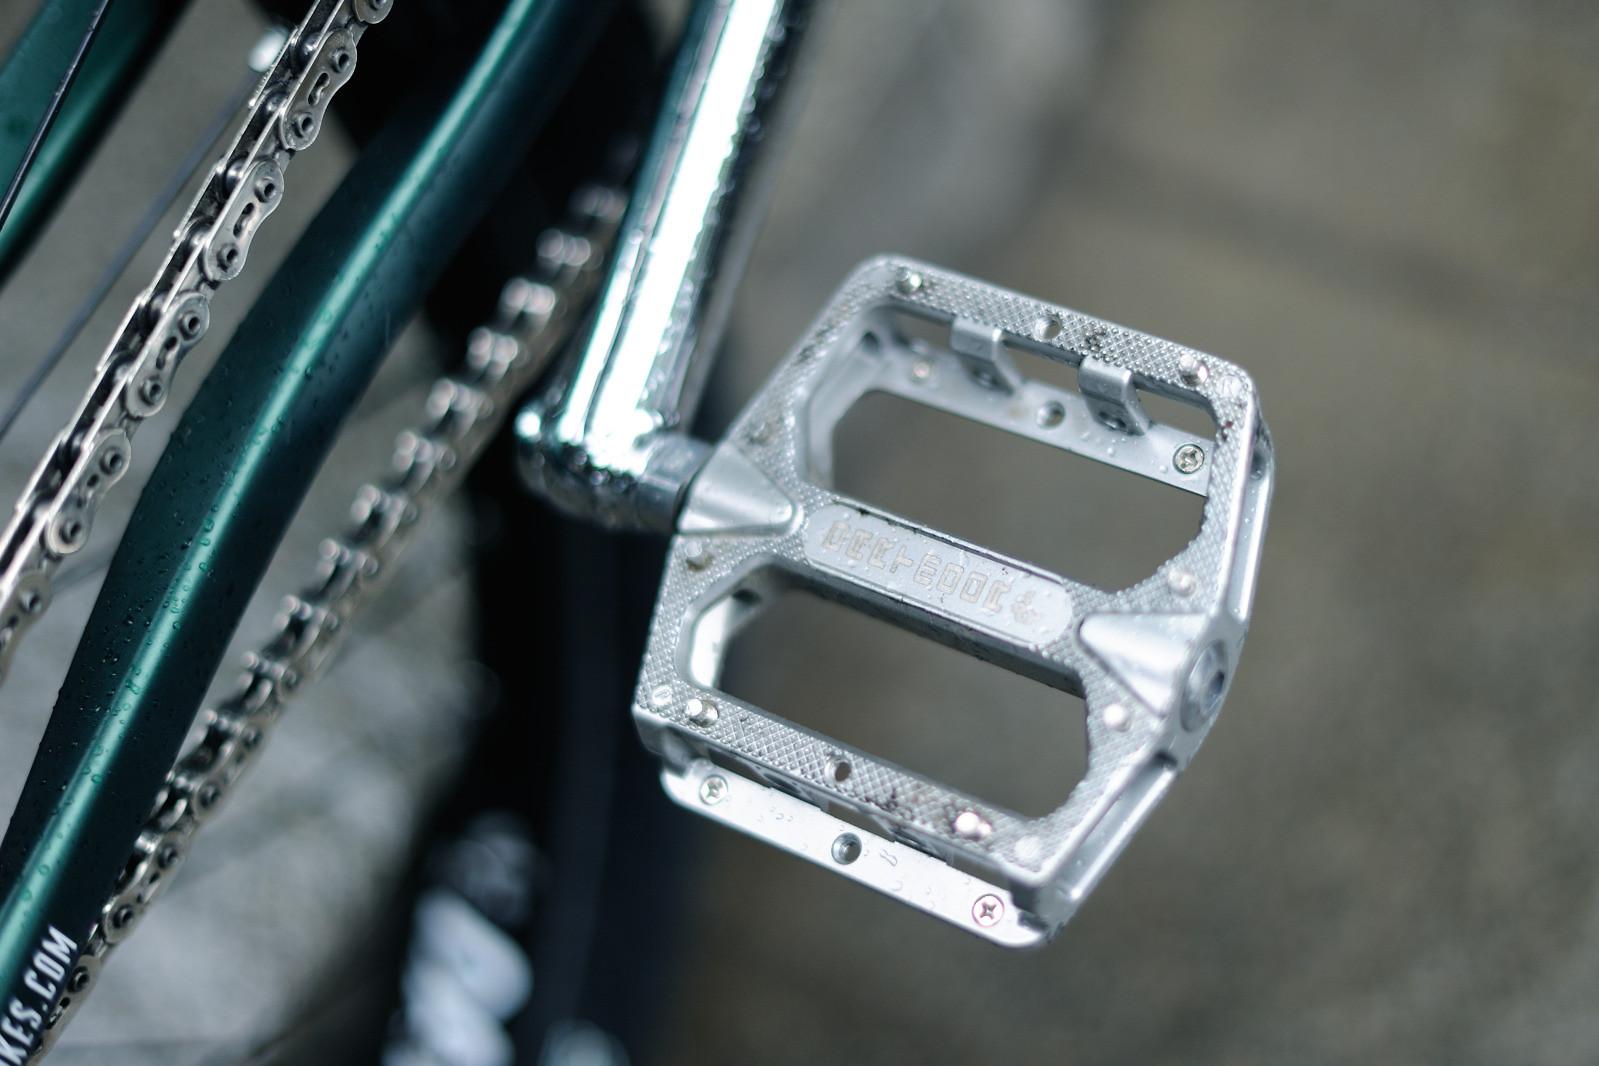 s3 - Dartmoor Bikes - Mountain Biking Pictures - Vital MTB